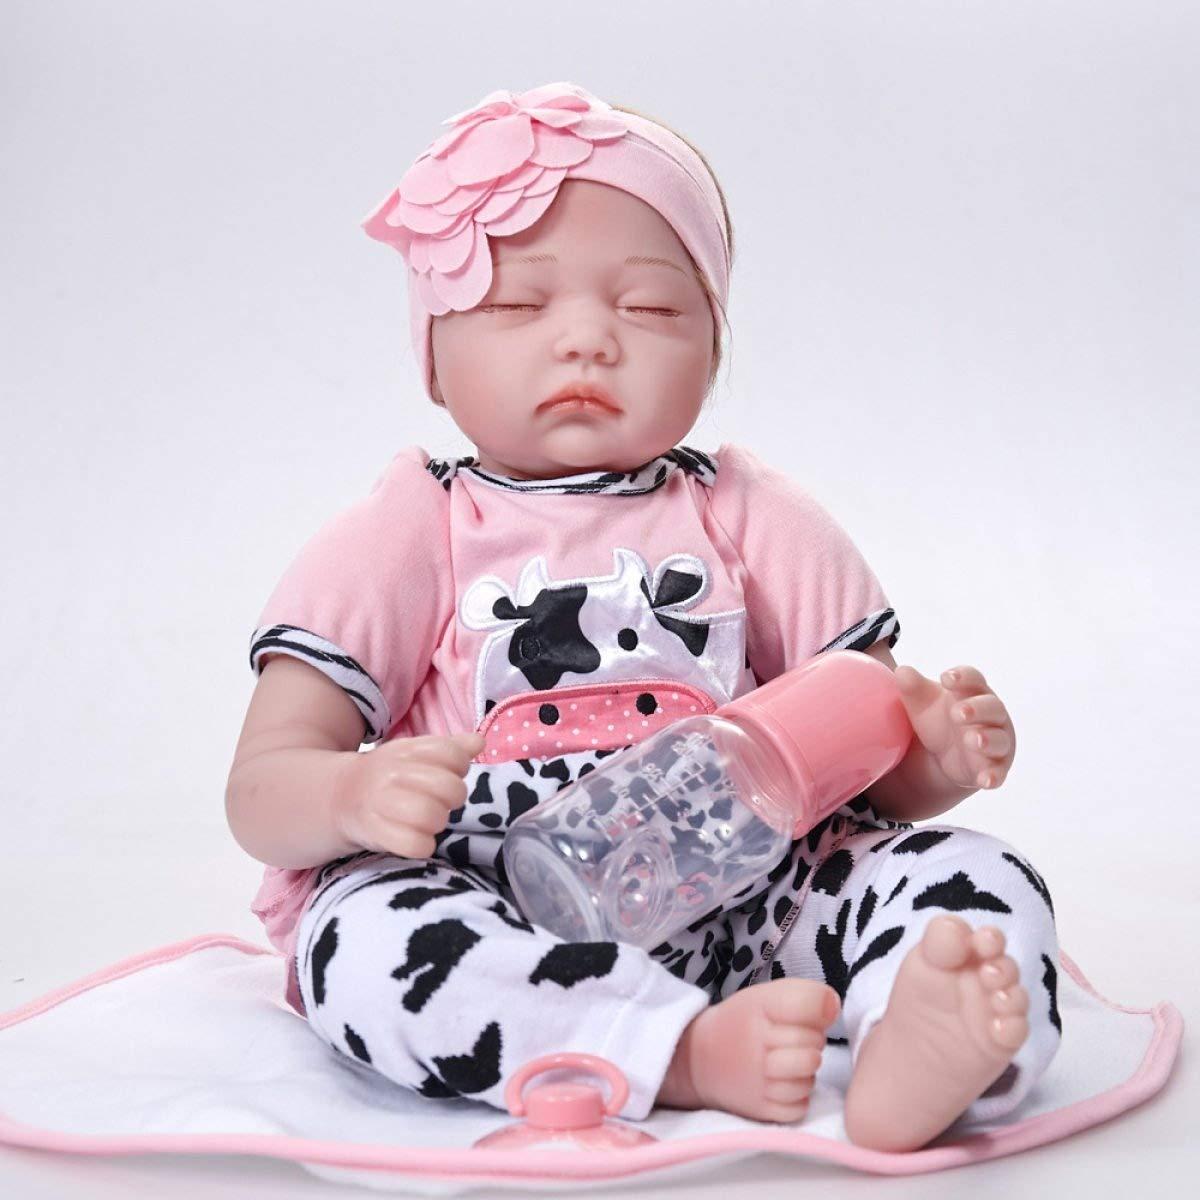 YIHANG Reborn Baby Puppen Handgemachte Lebensechte Realistische Silikon Vinyl Baby Puppe Weiche Simulation 22 Zoll 55 Cm Augen Geschlossen Mädchen Lieblings Geschenk